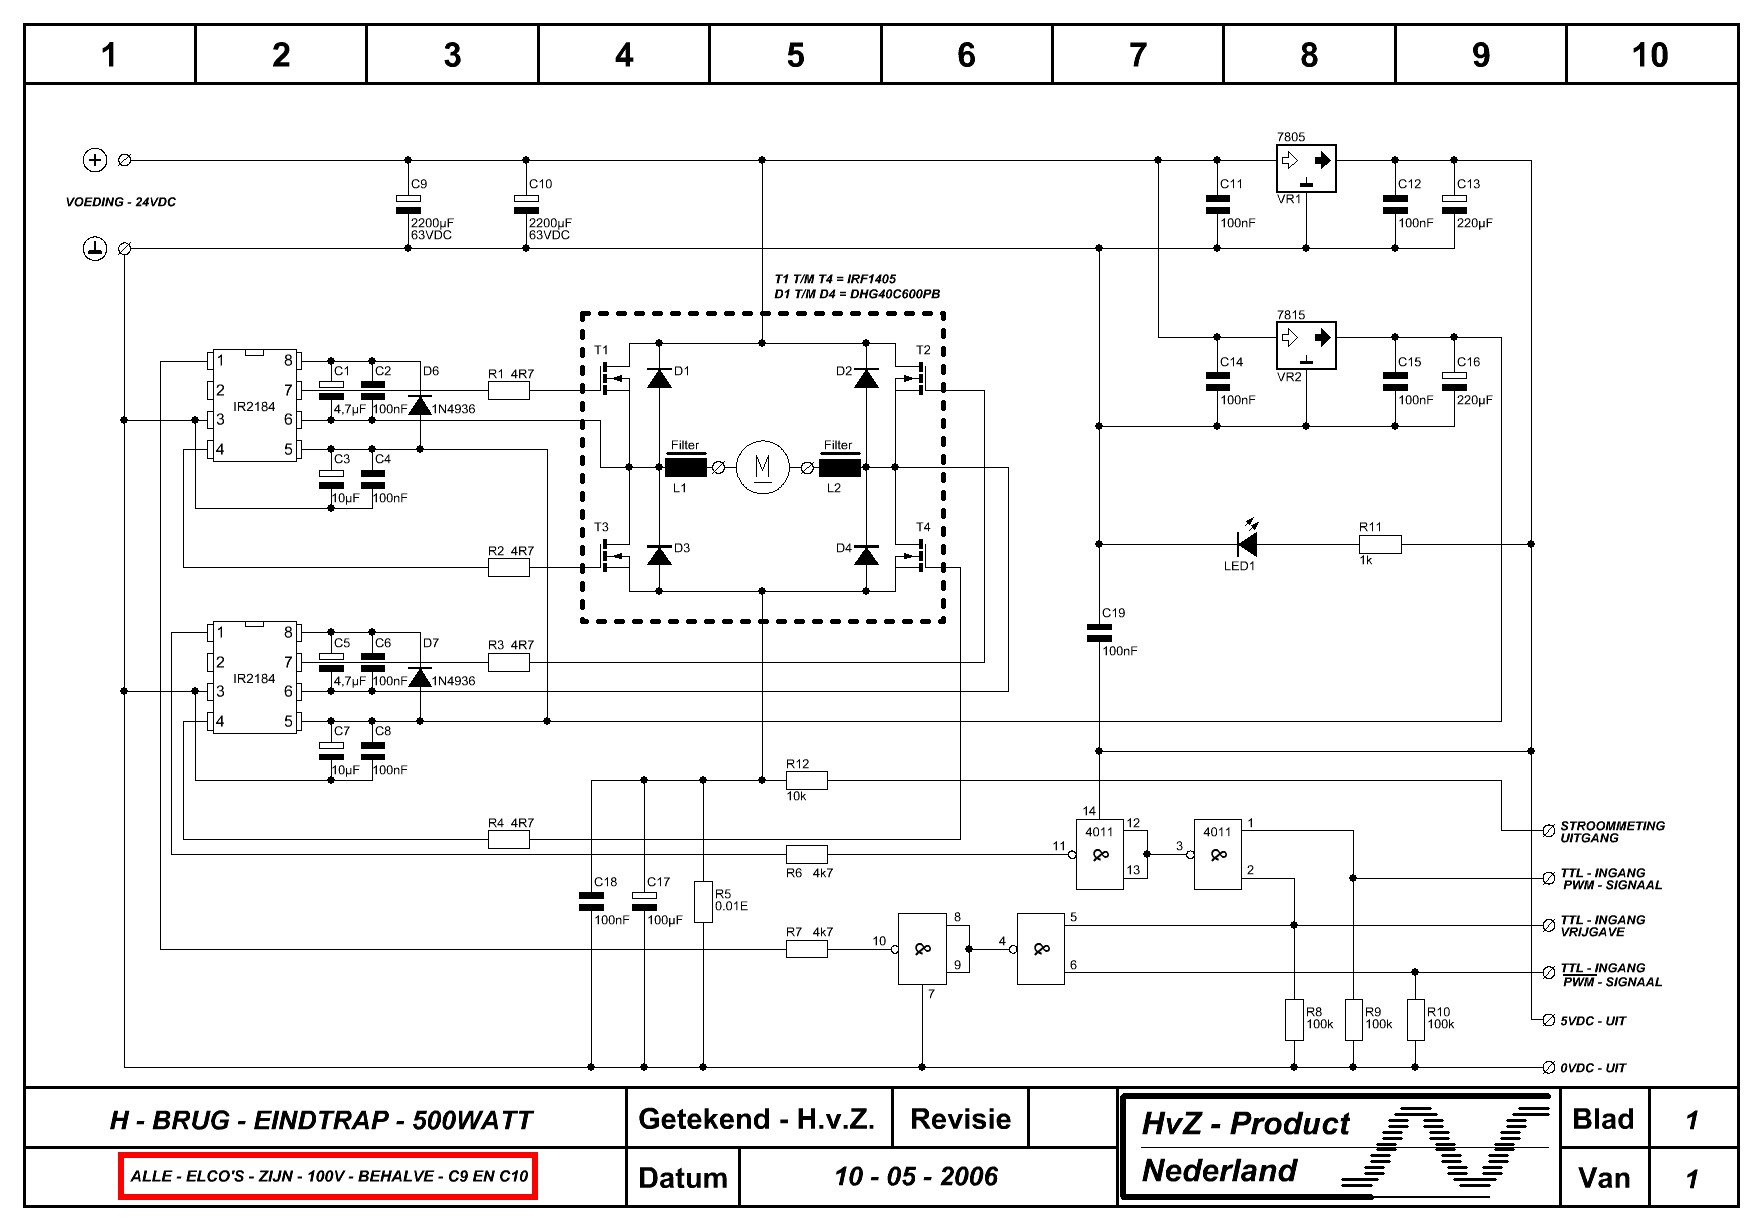 Mosfet H Bridge Motor Driver Dmv Pwm Forum Circuits Online Led Circuit Calculator Http Wwwcircuitsonlinenet Download 48 Uploadarchiefnet Files Brug20met20mosfets